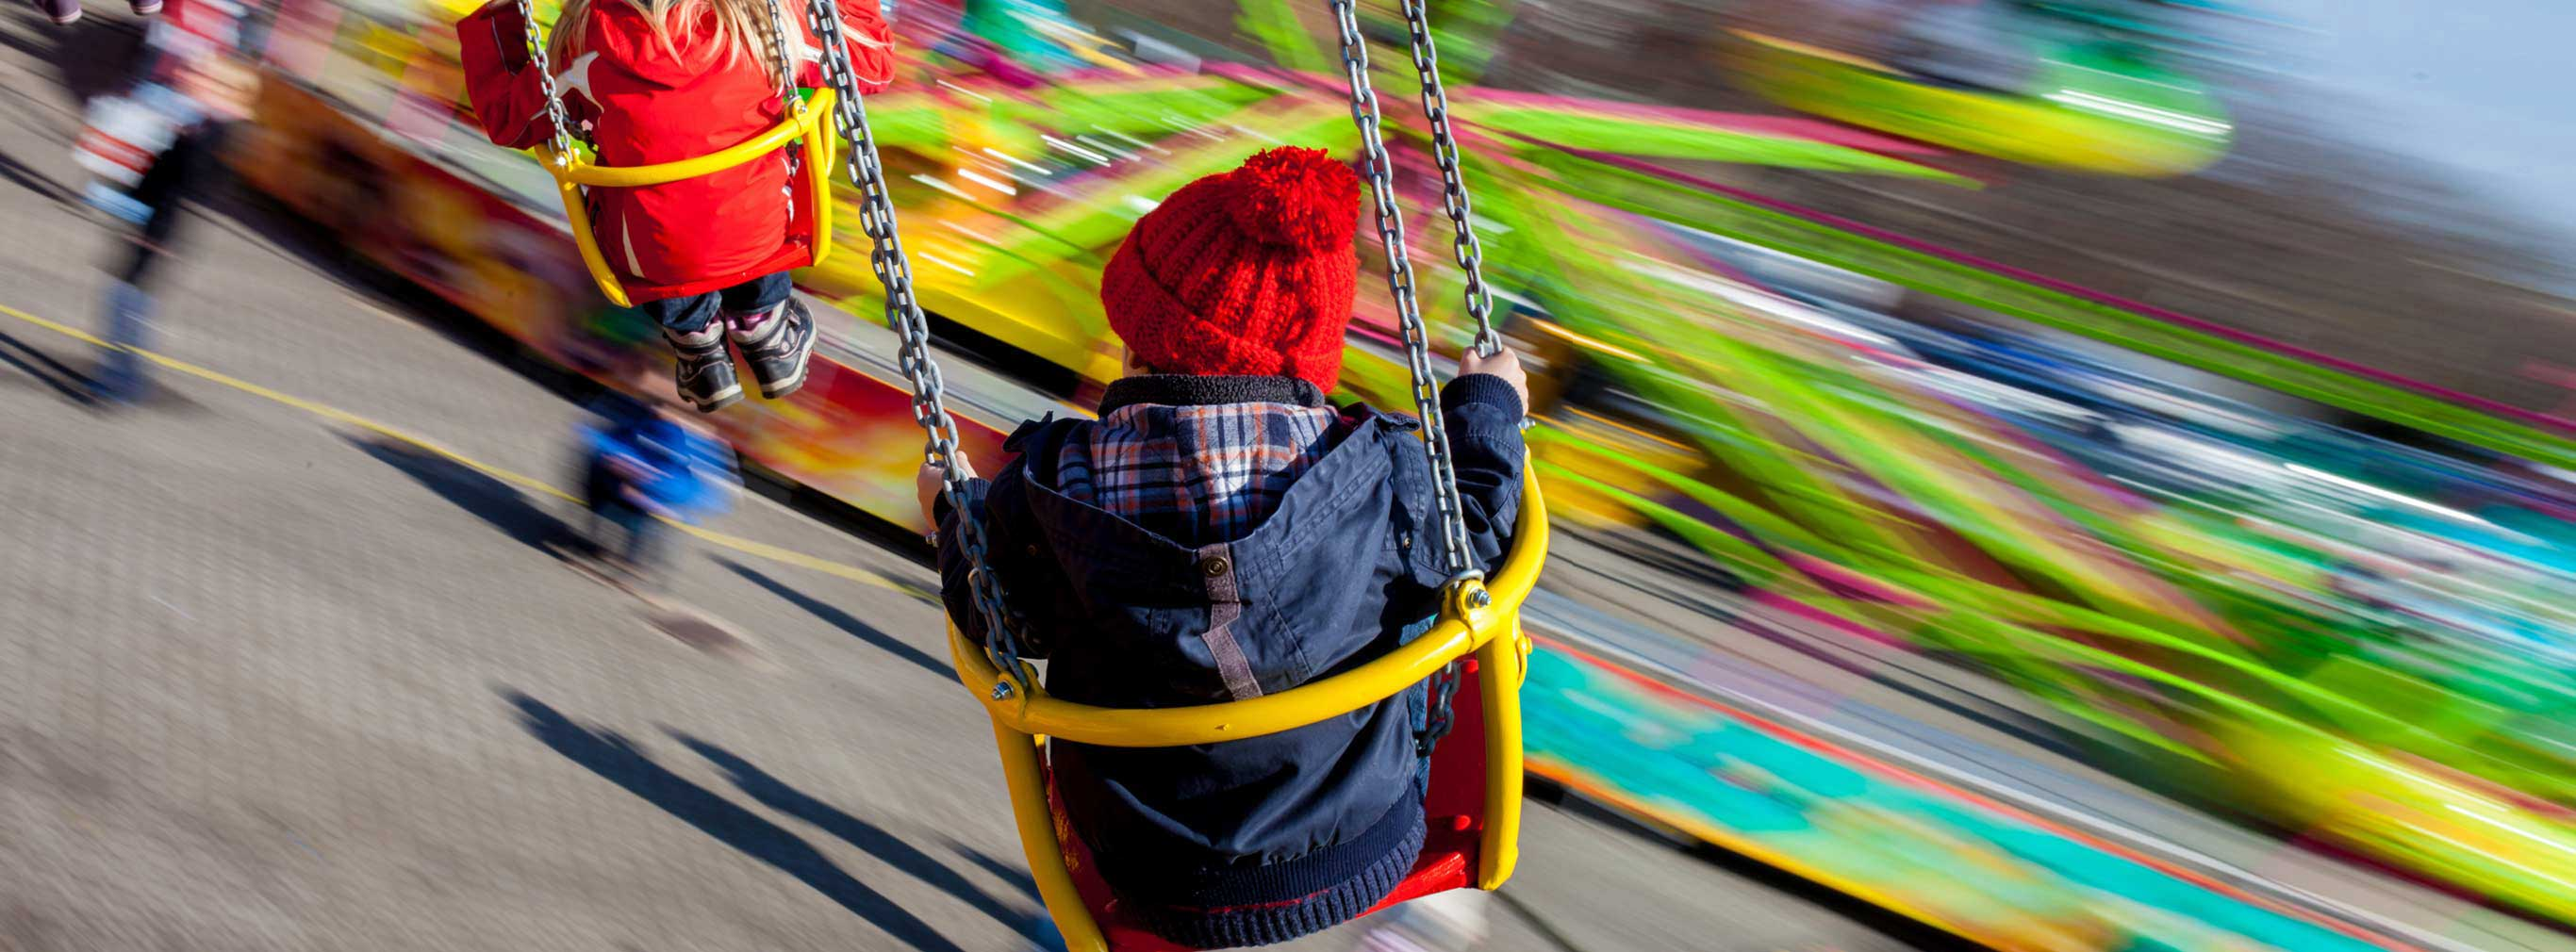 carnival amusements of s a kids having fun on a swing chain carousel ride